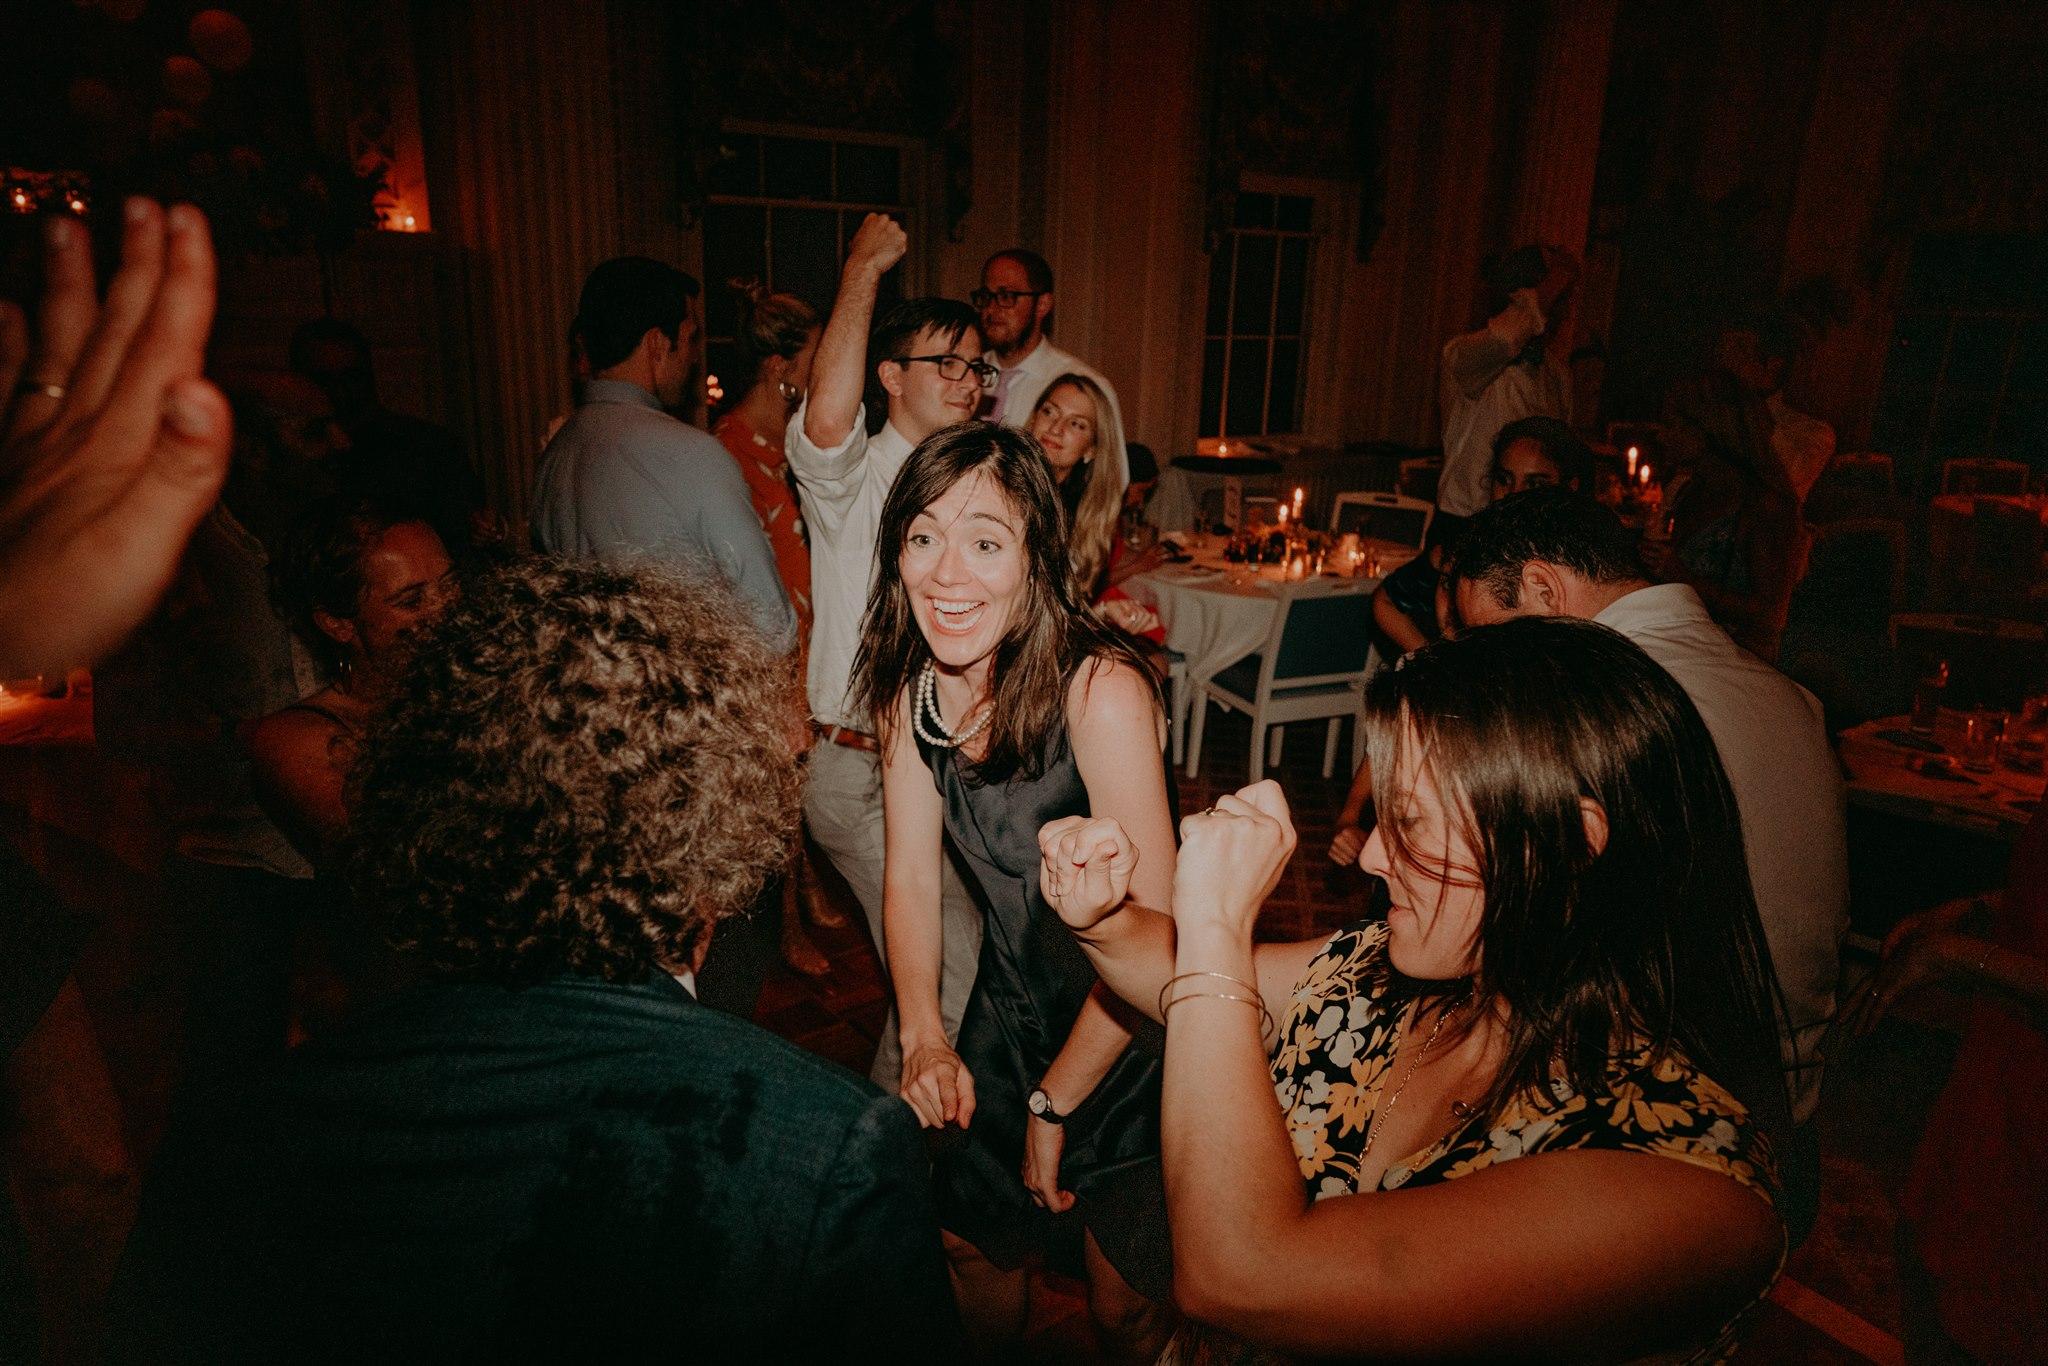 Chellise_Michael_Photography_Hudson_Valley_Wedding_Photographer_Otesaga_Hotel-6237.jpg